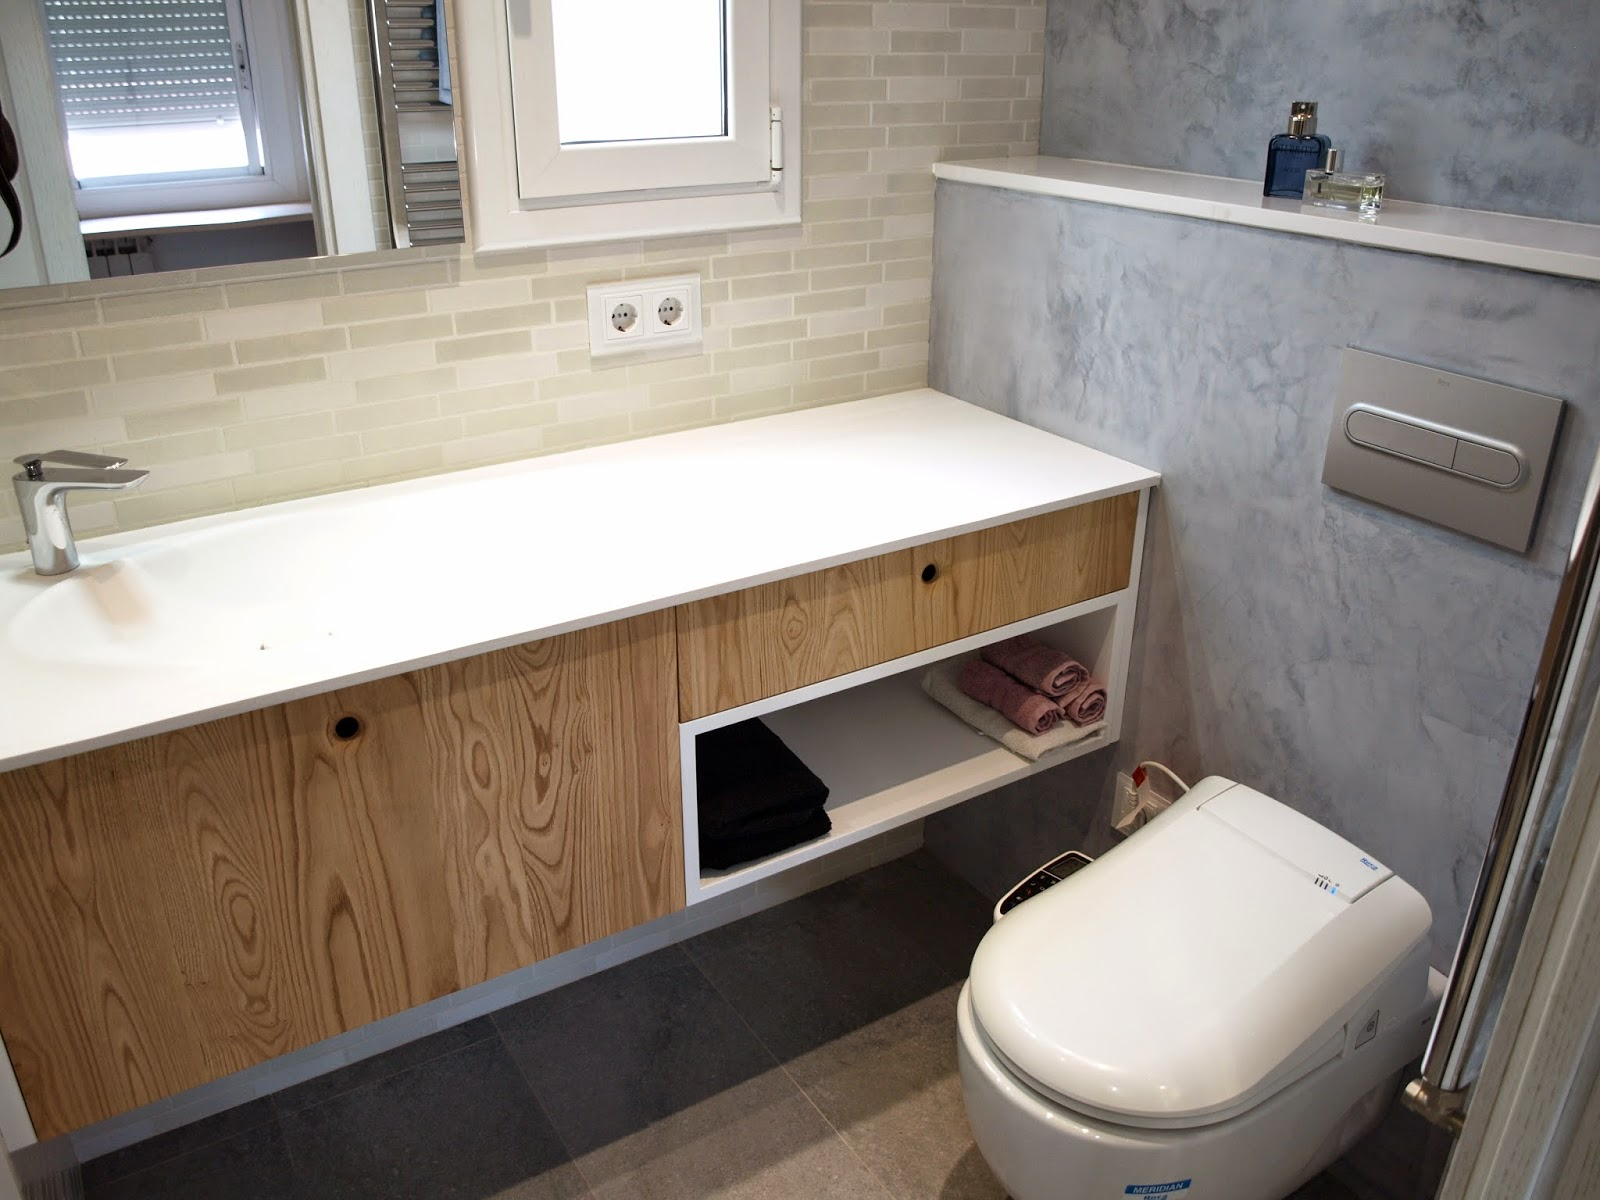 Muebles De Baño Orion:el pavimento hicimos un tabique con aplicación de microcemento para